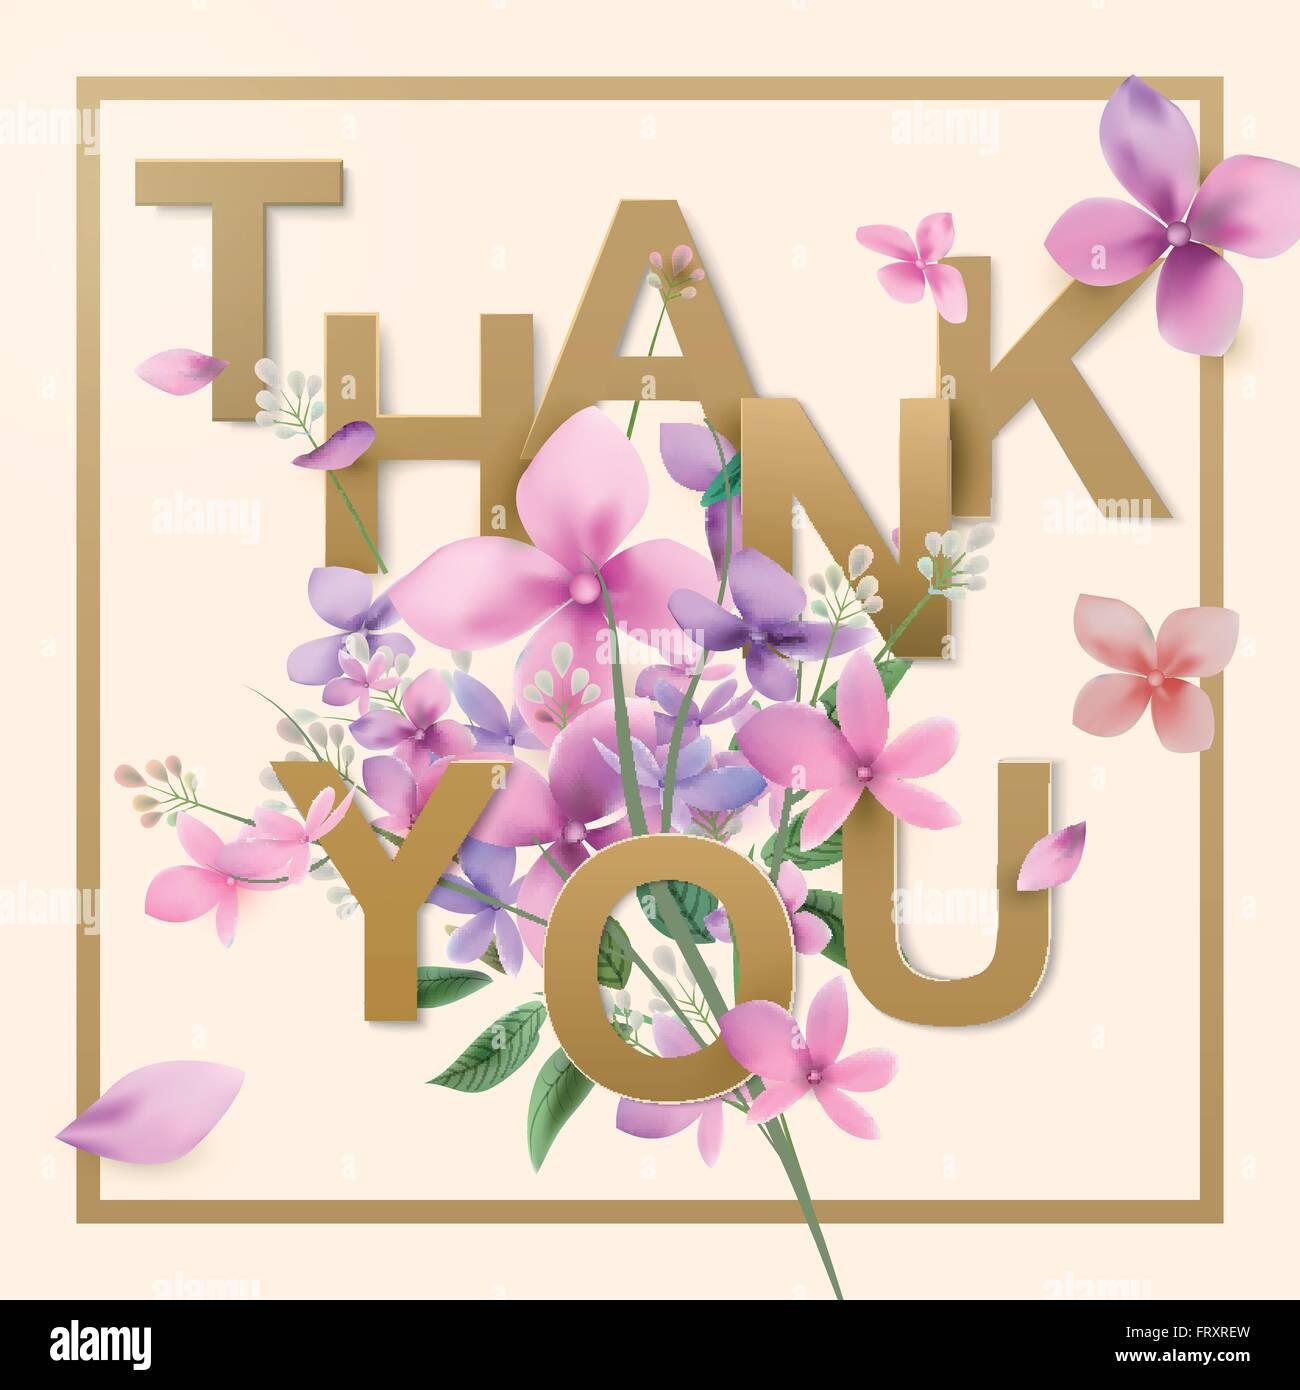 romantic watercolor flowers thank you card design template stock vector art illustration. Black Bedroom Furniture Sets. Home Design Ideas